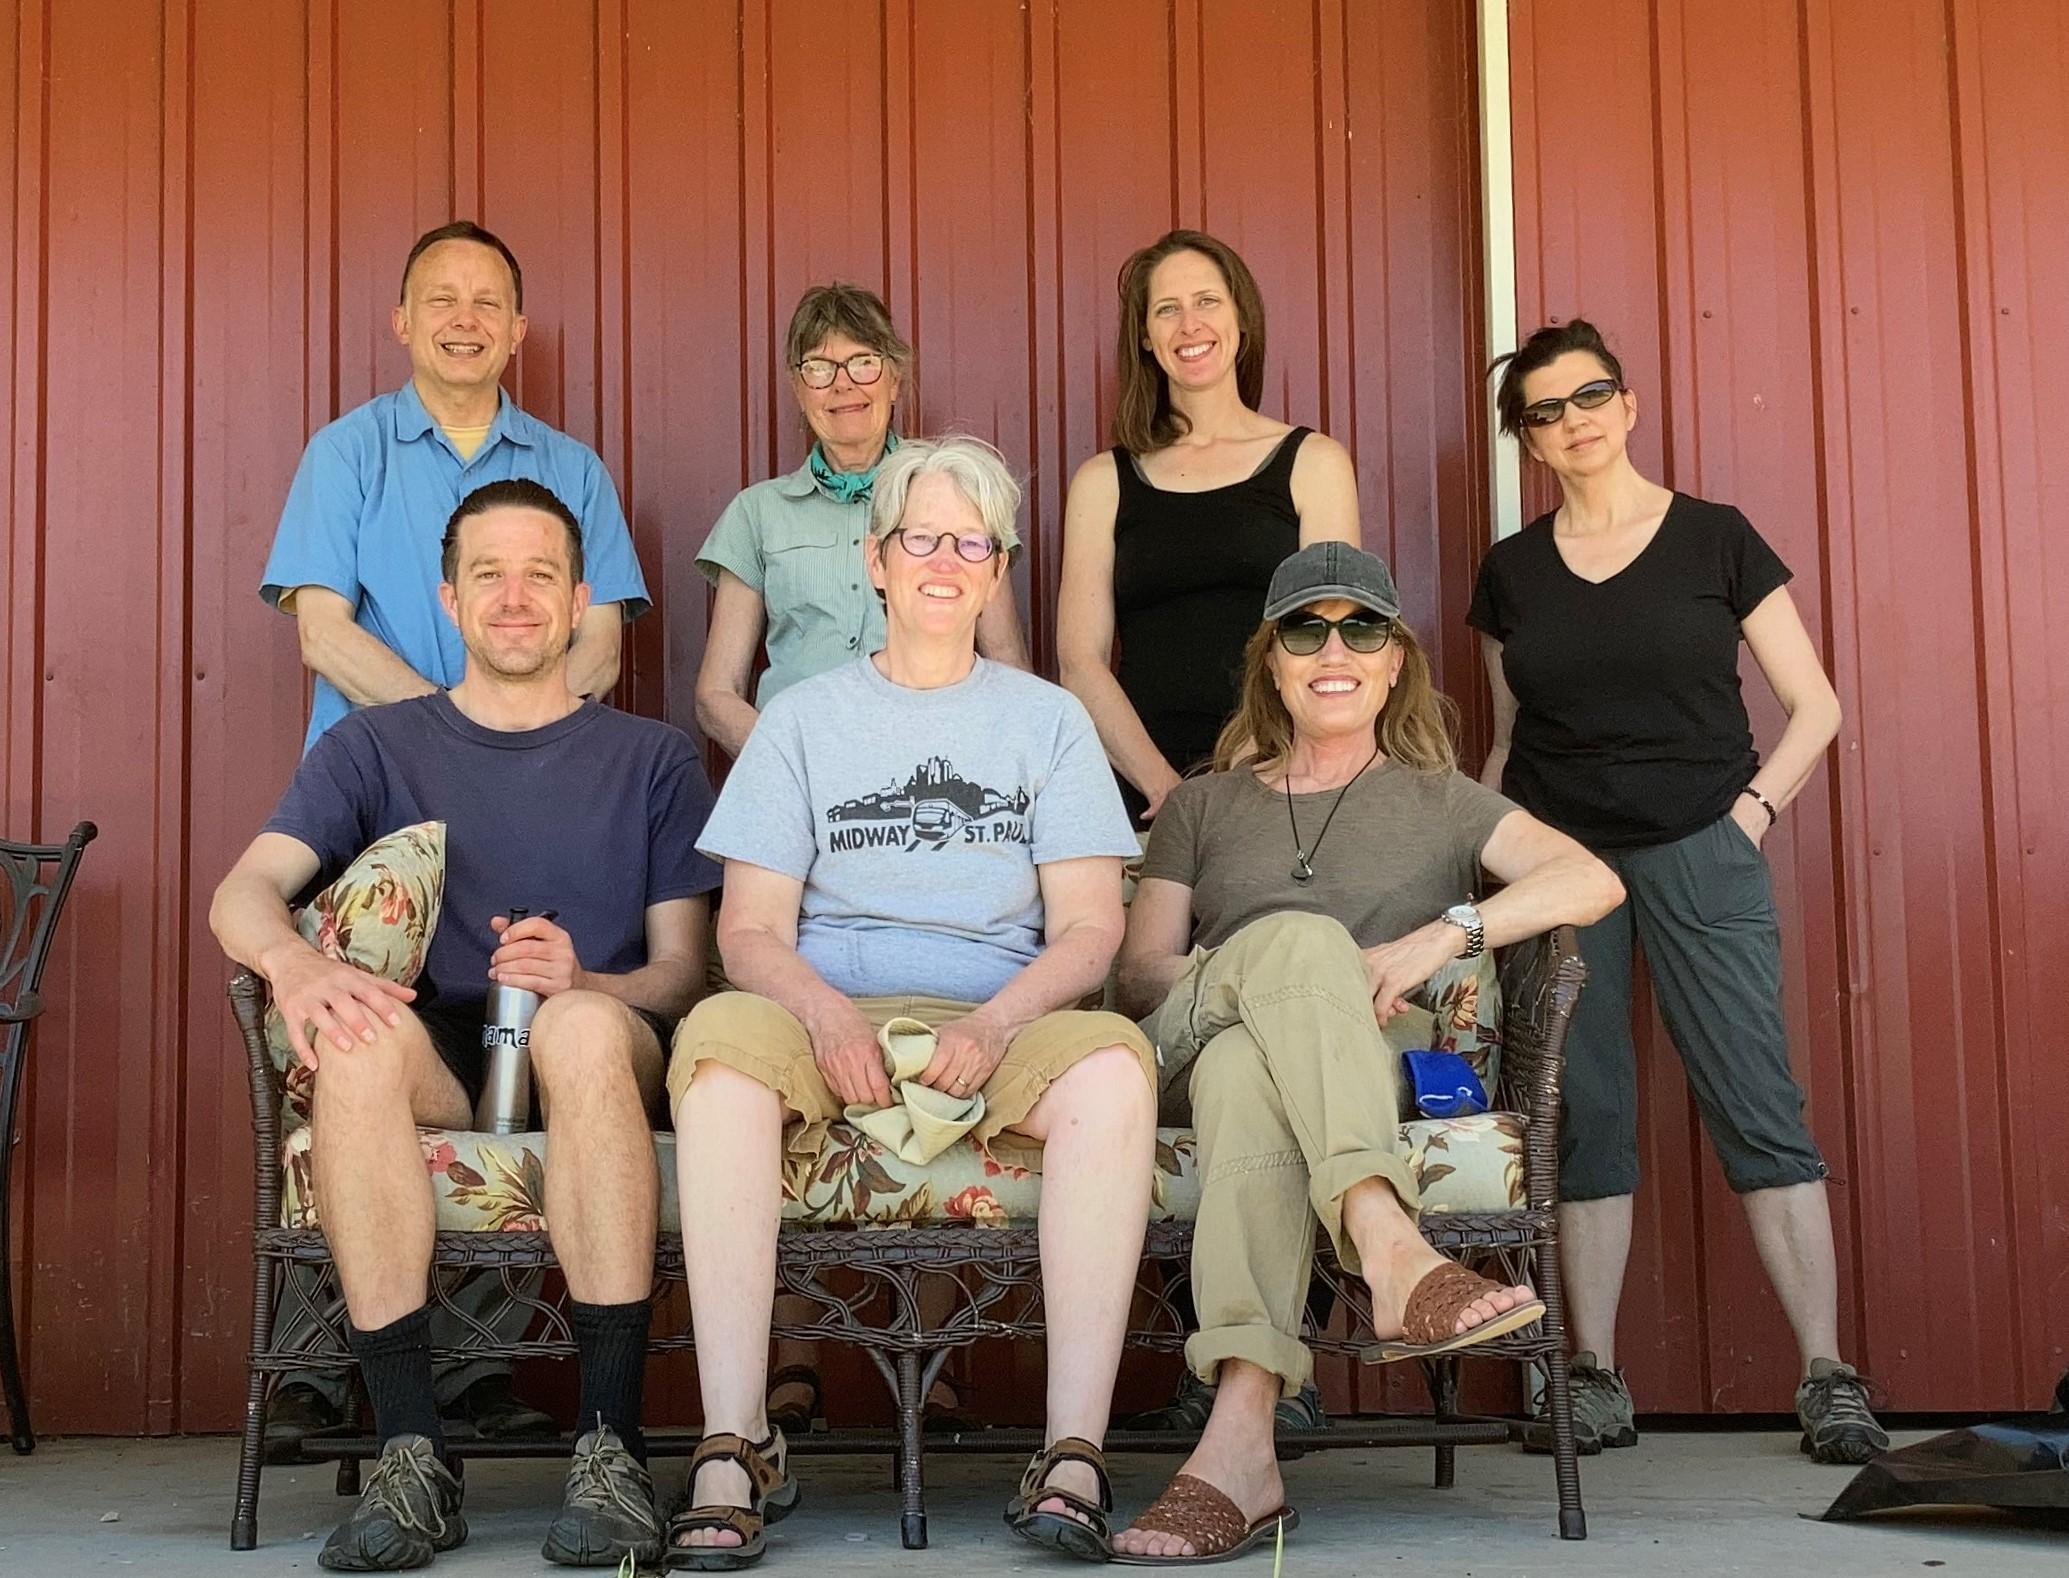 photo of7 work retreatants looking happy